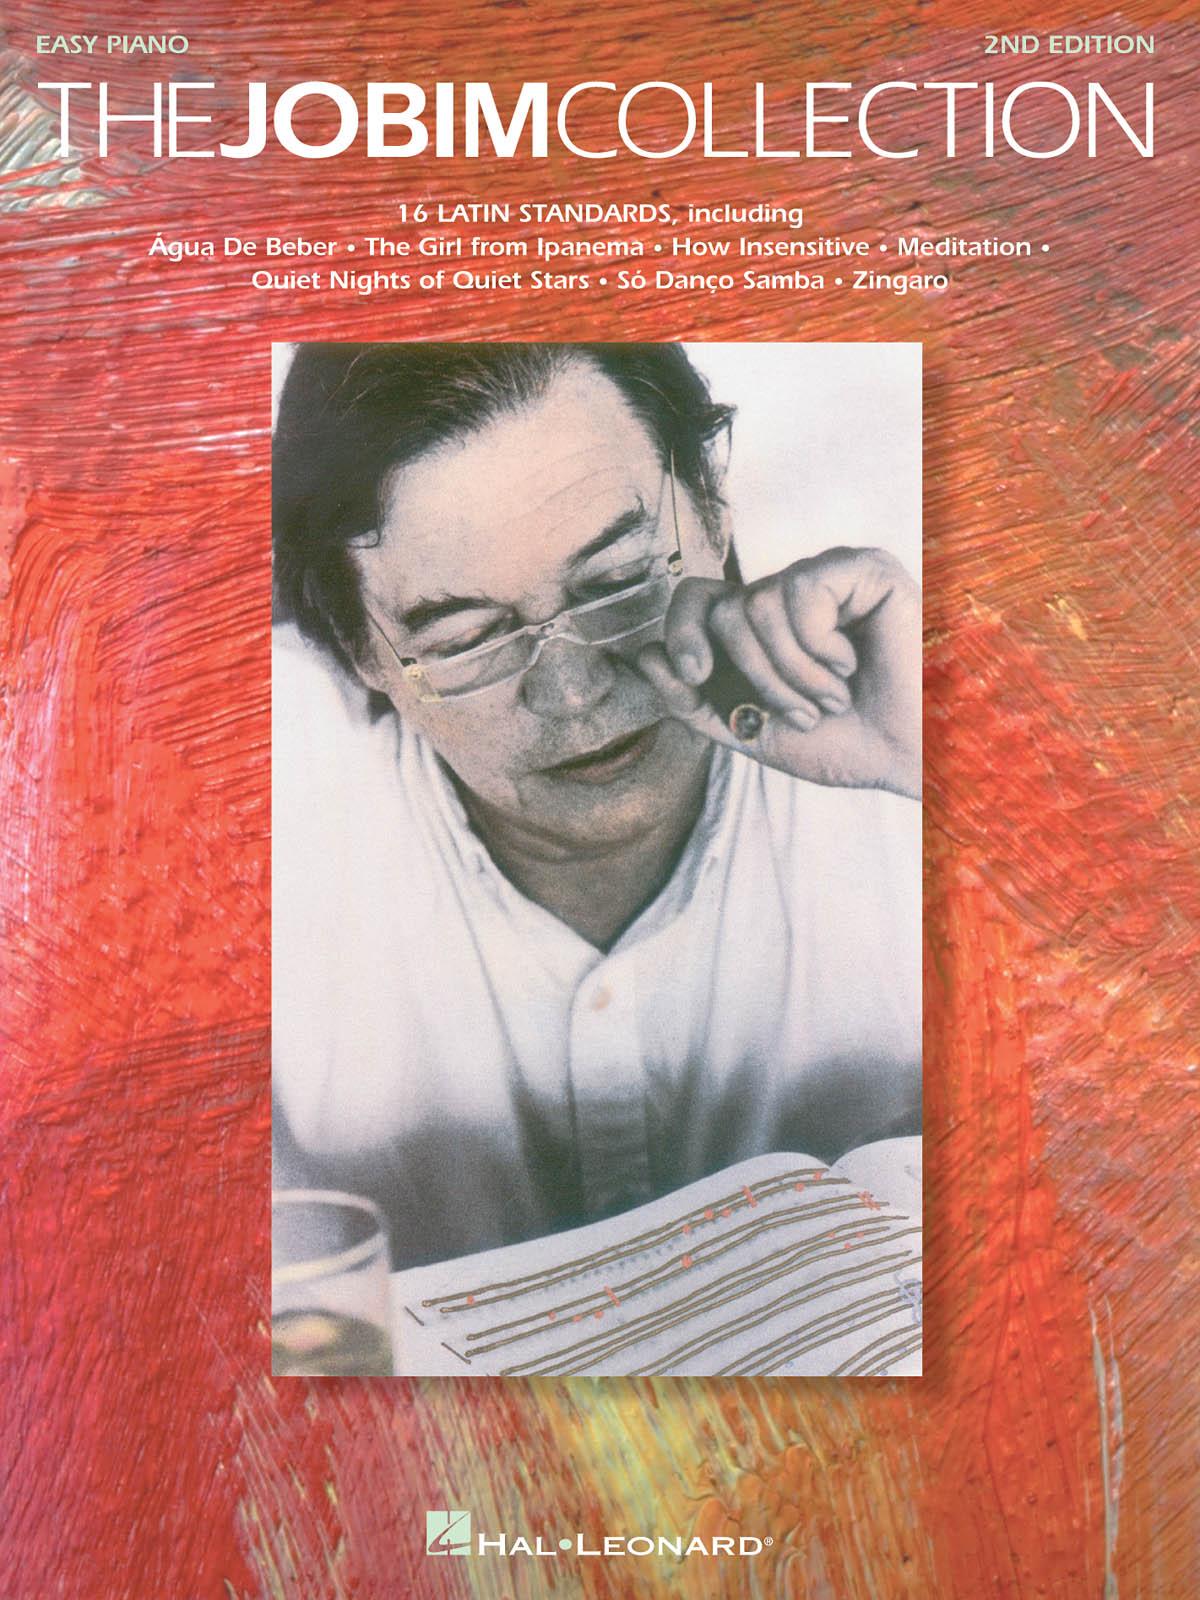 Antonio Carlos Jobim: The Jobim Collection - 2nd Edition: Easy Piano: Artist